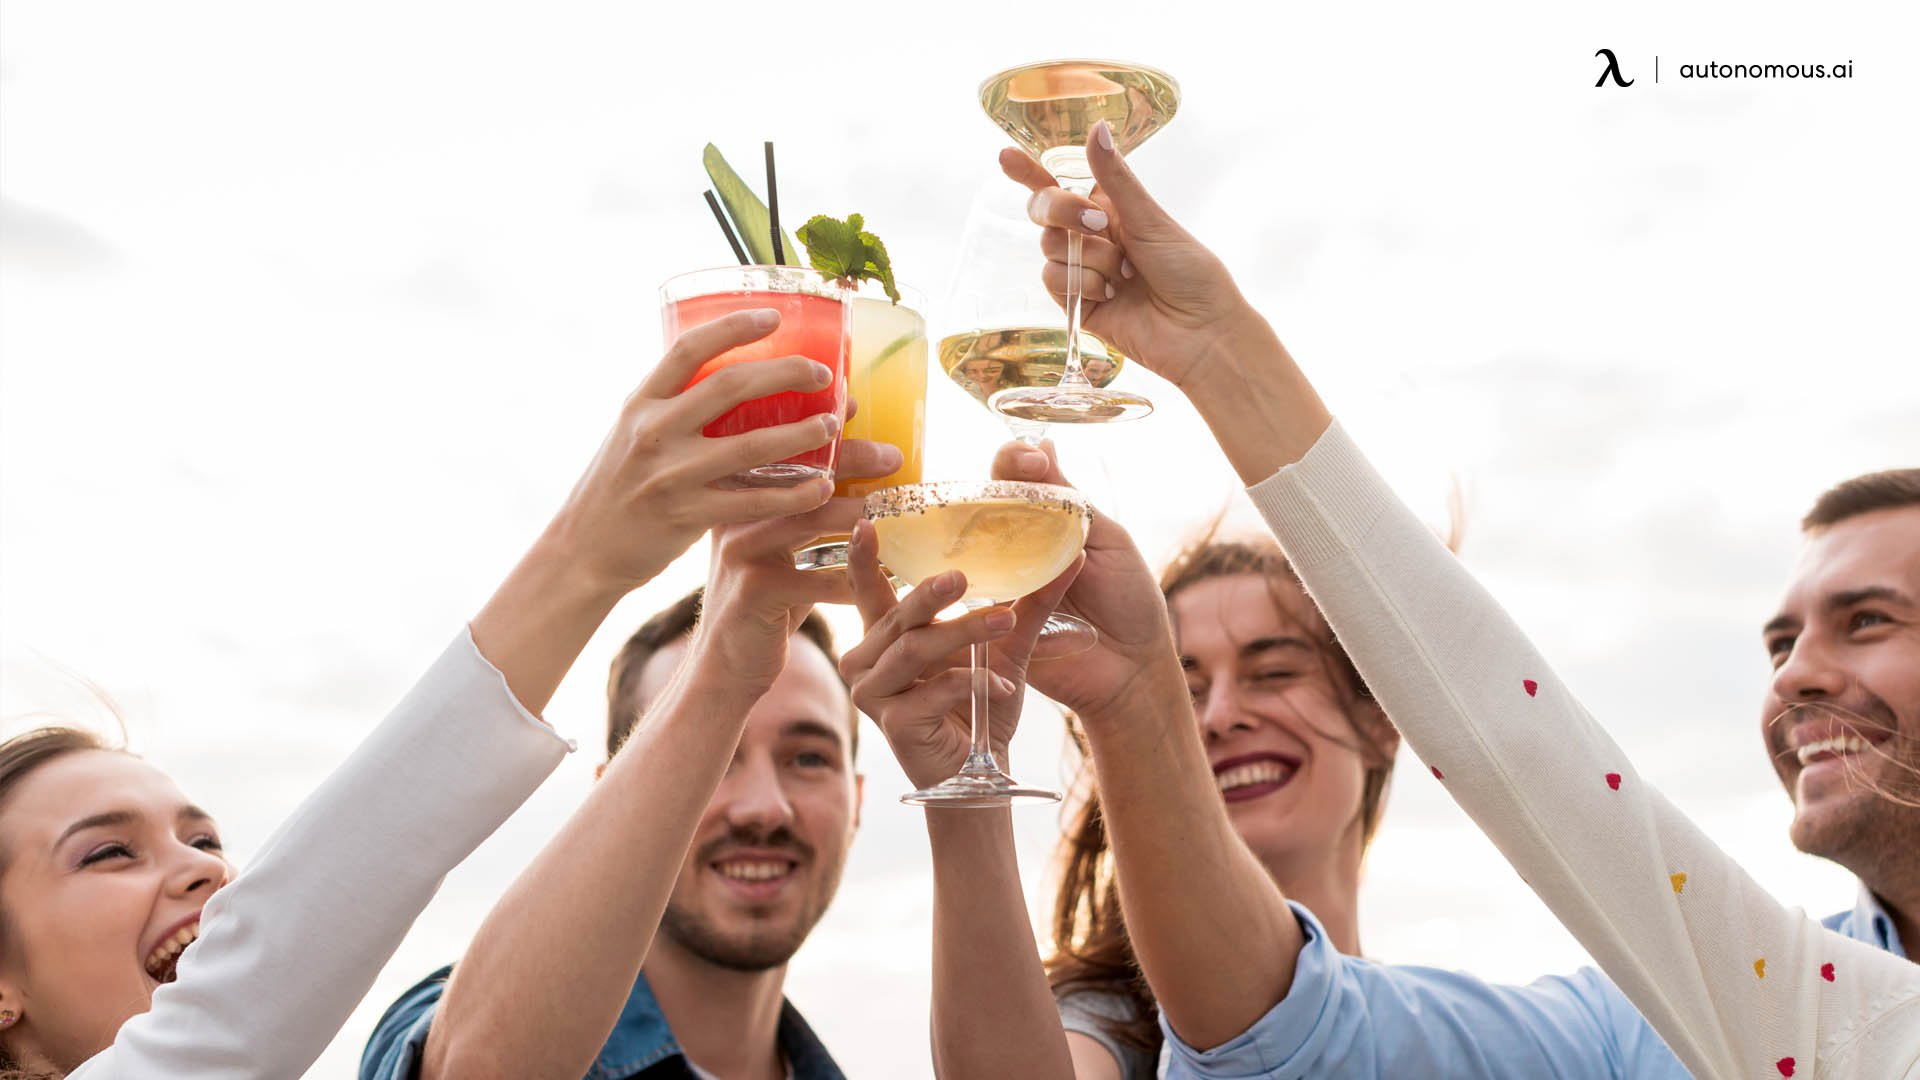 Have A Pub/Margarita Day